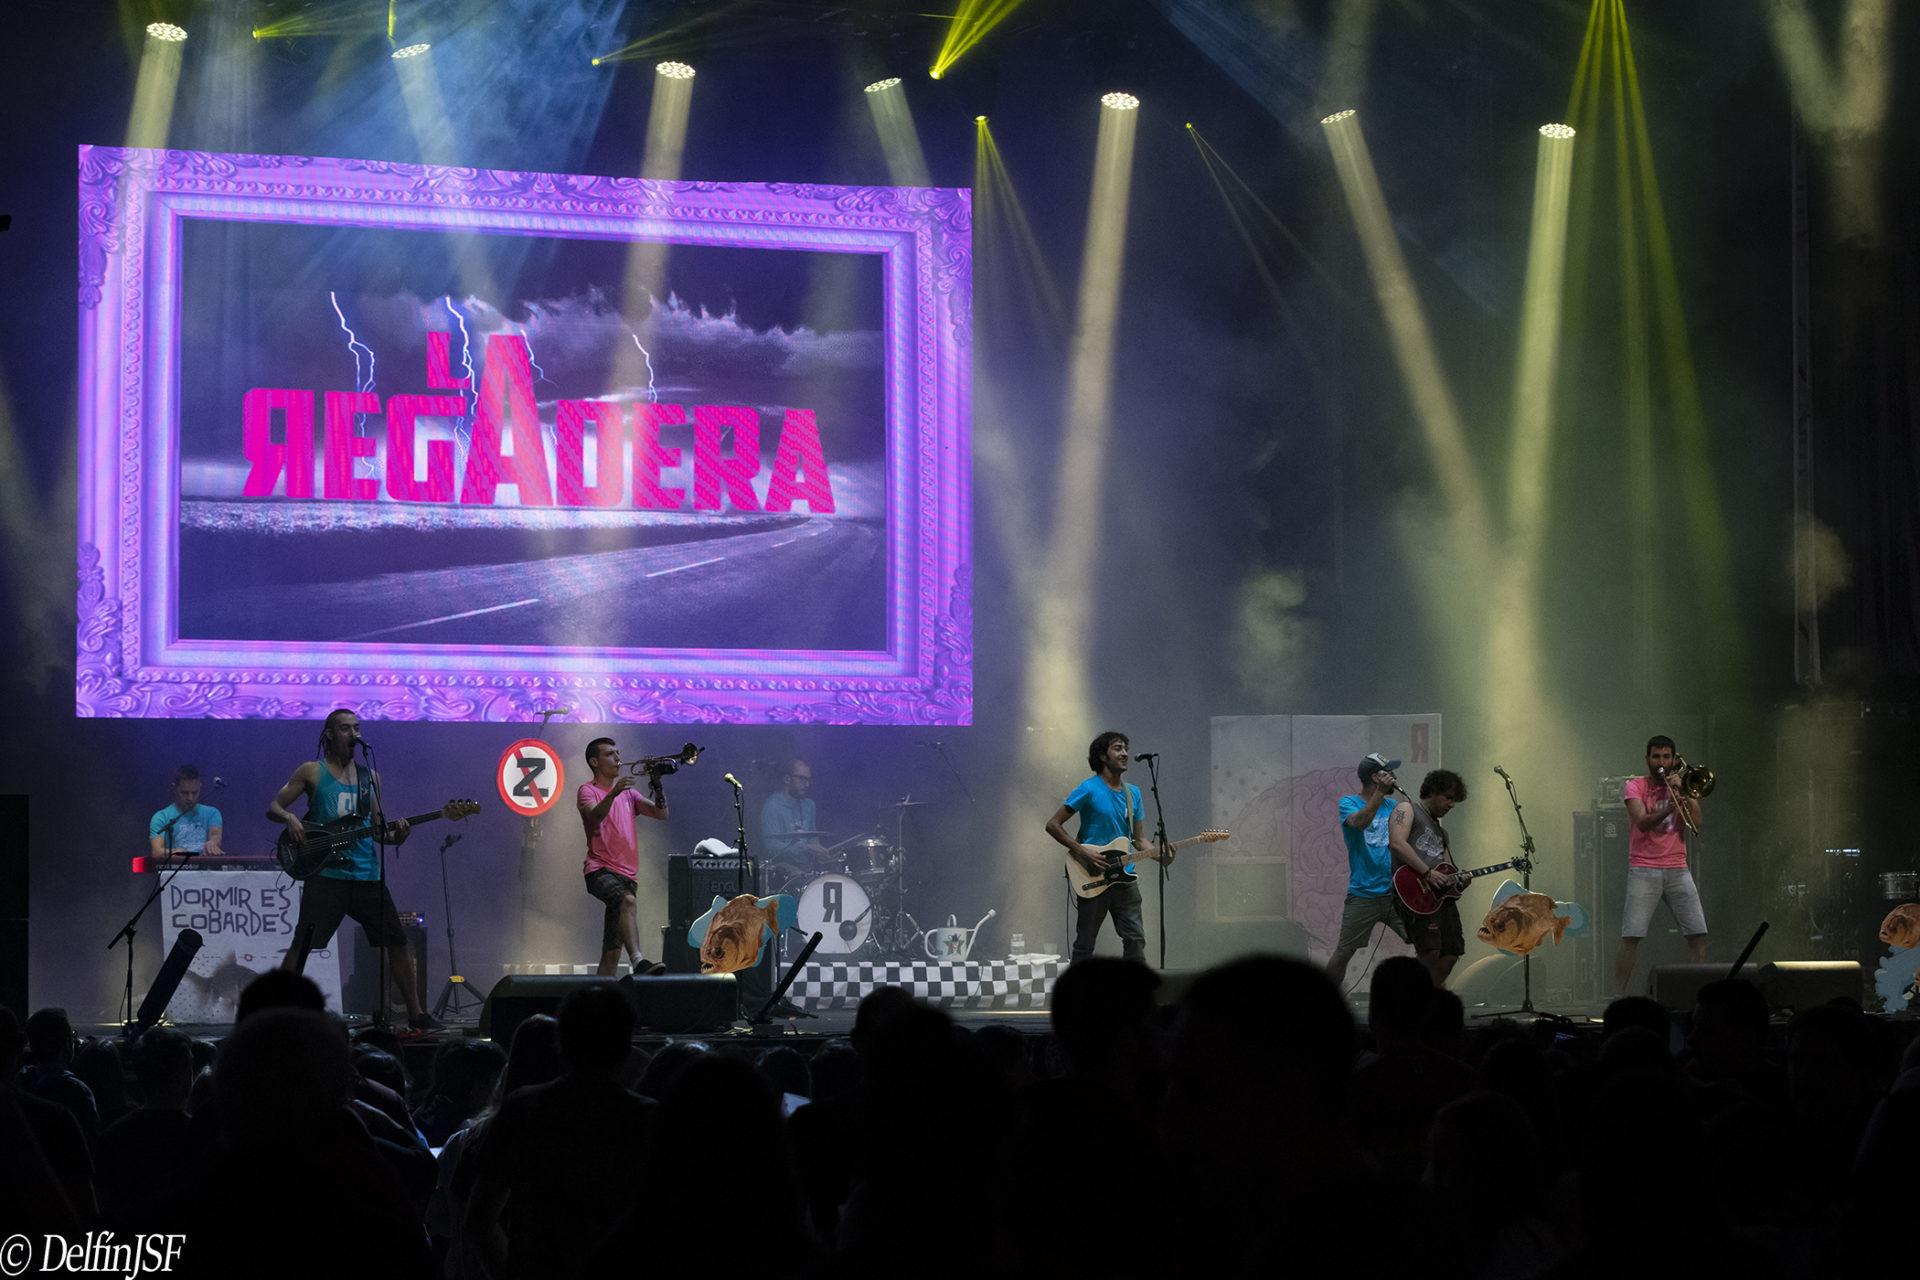 SKA-P #Pilares2019, DelfínJSF